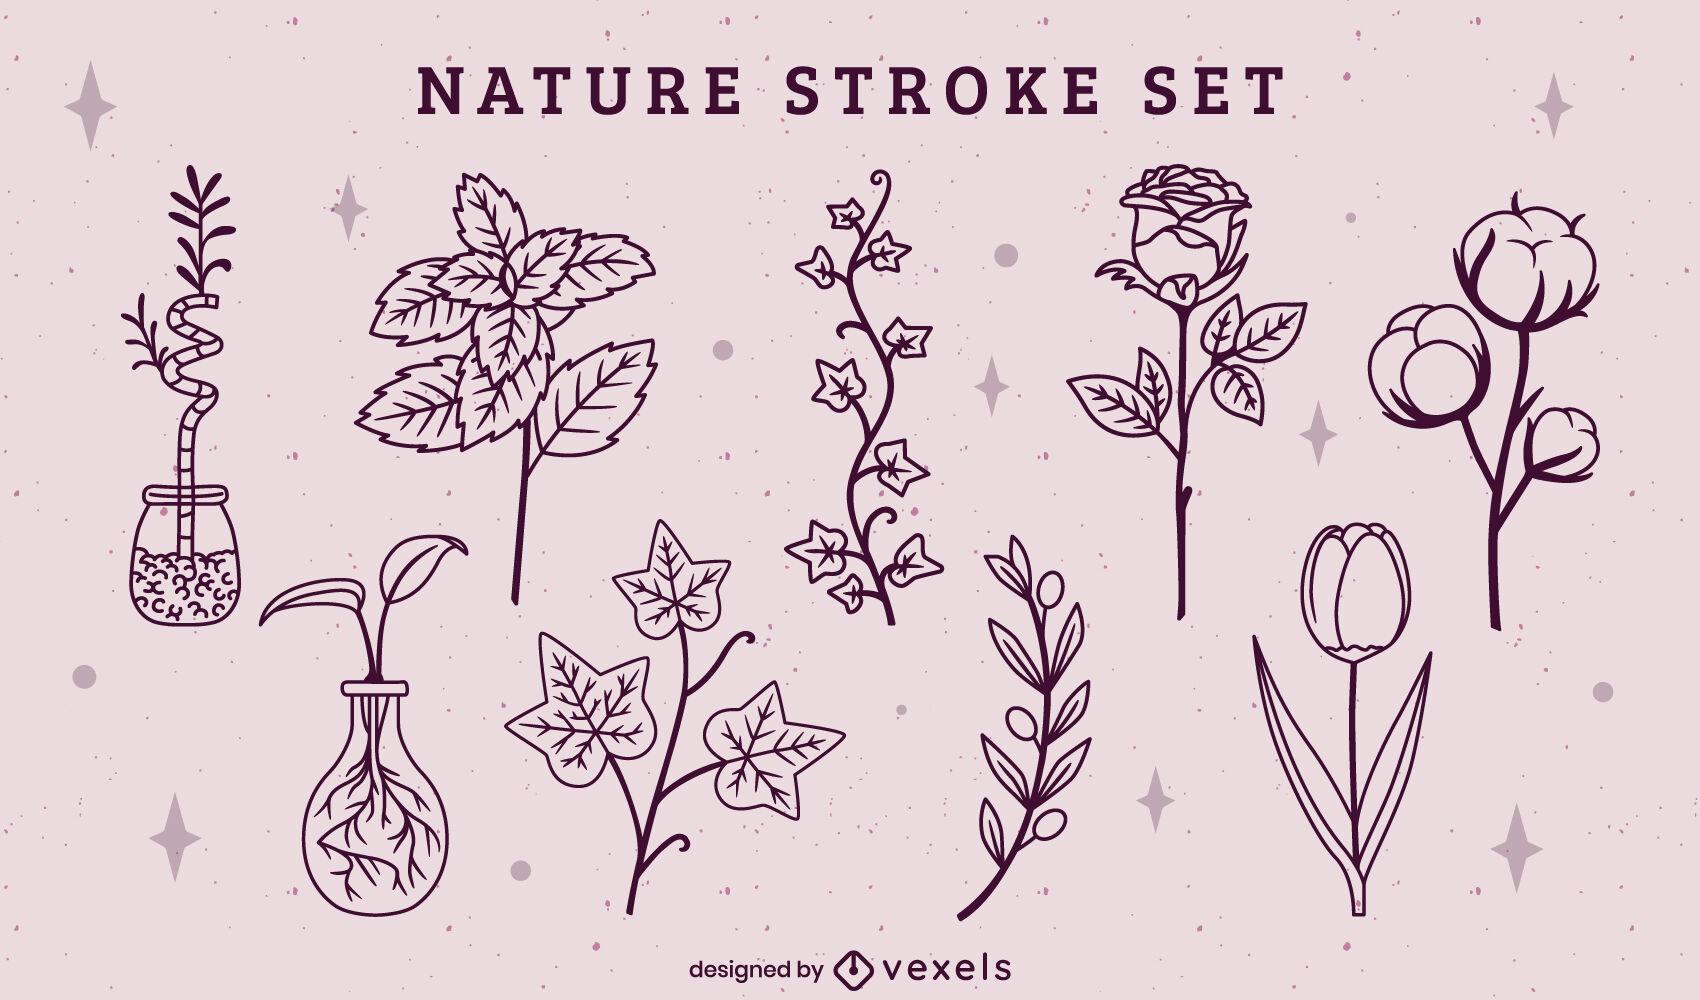 Nature stroke elements set